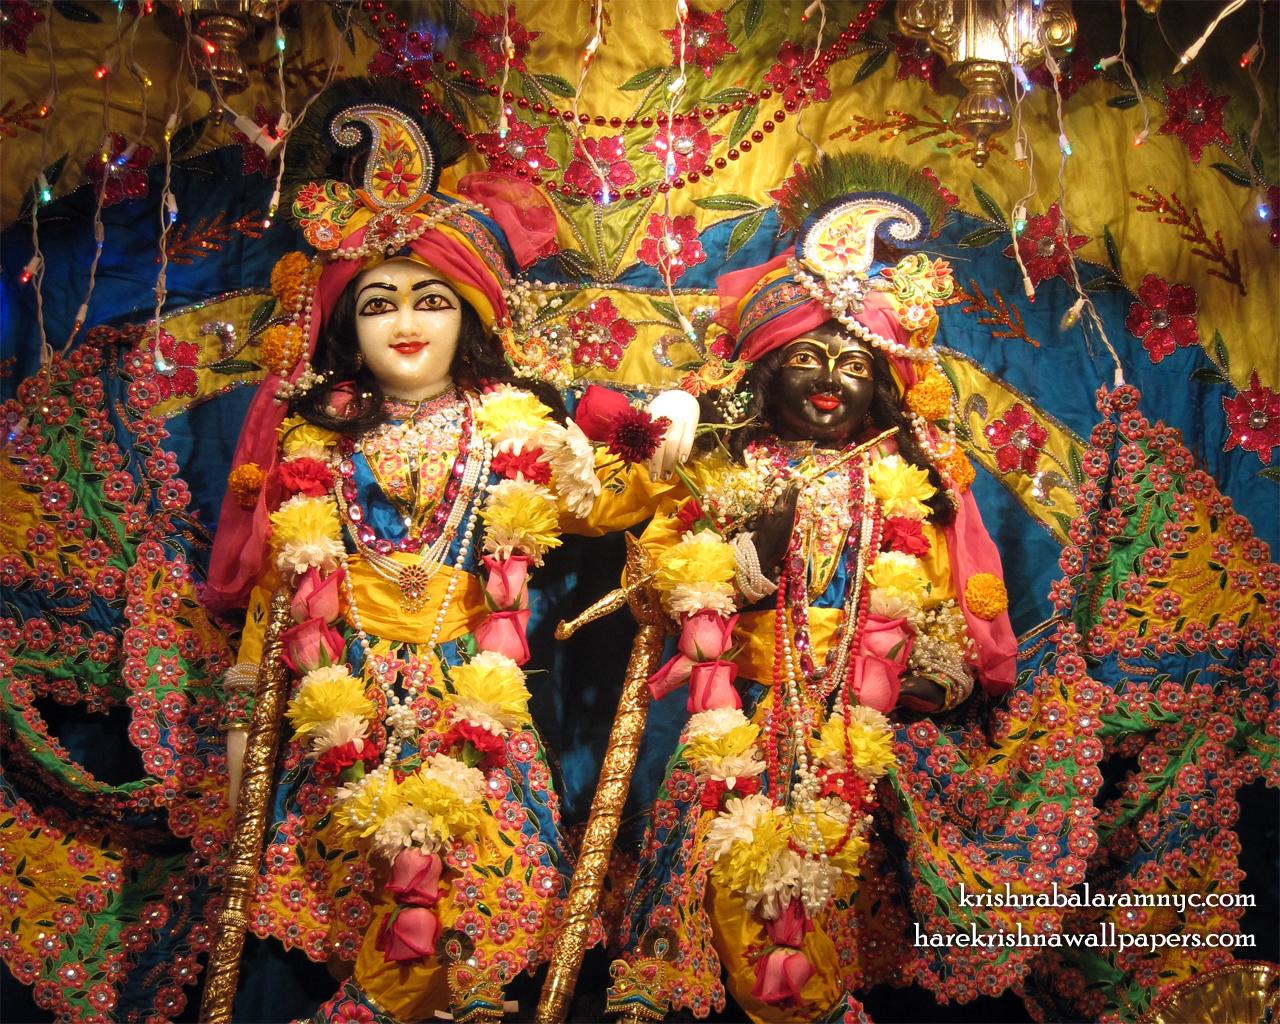 Sri Sri Hari Haladhari Close up Wallpaper (002) Size 1280x1024 Download